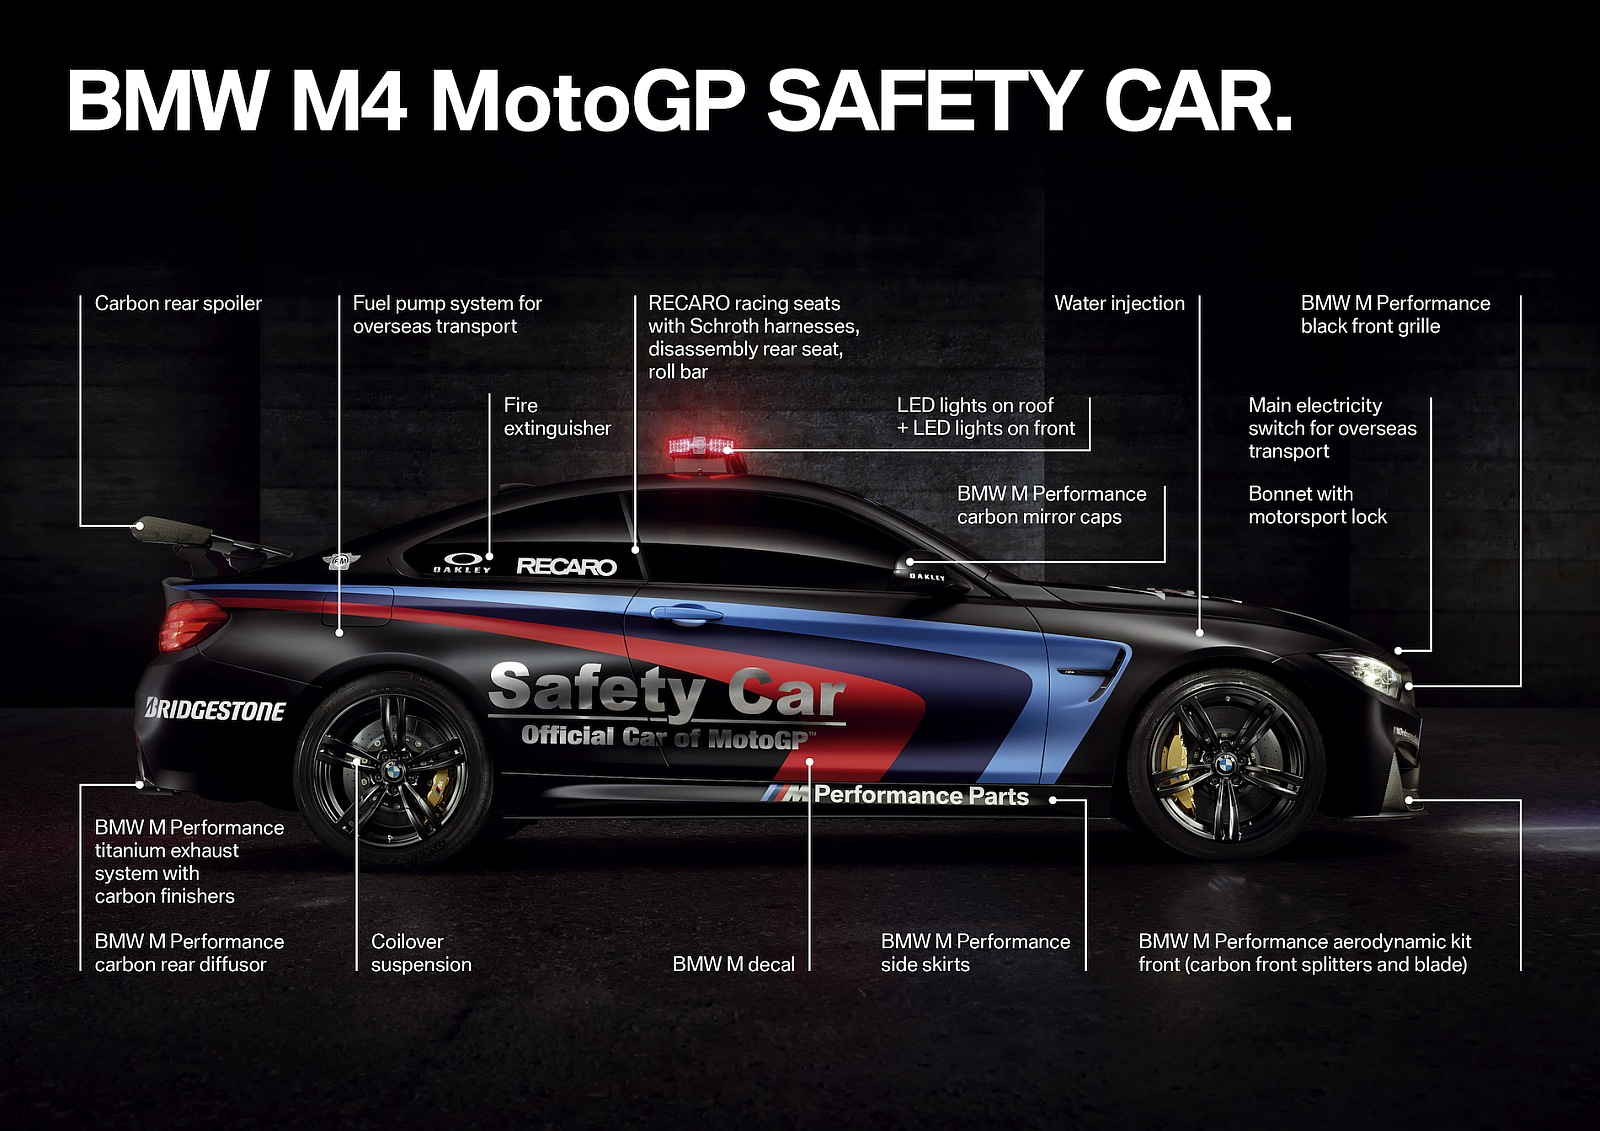 2015 BMW M4 MotoGP safety car